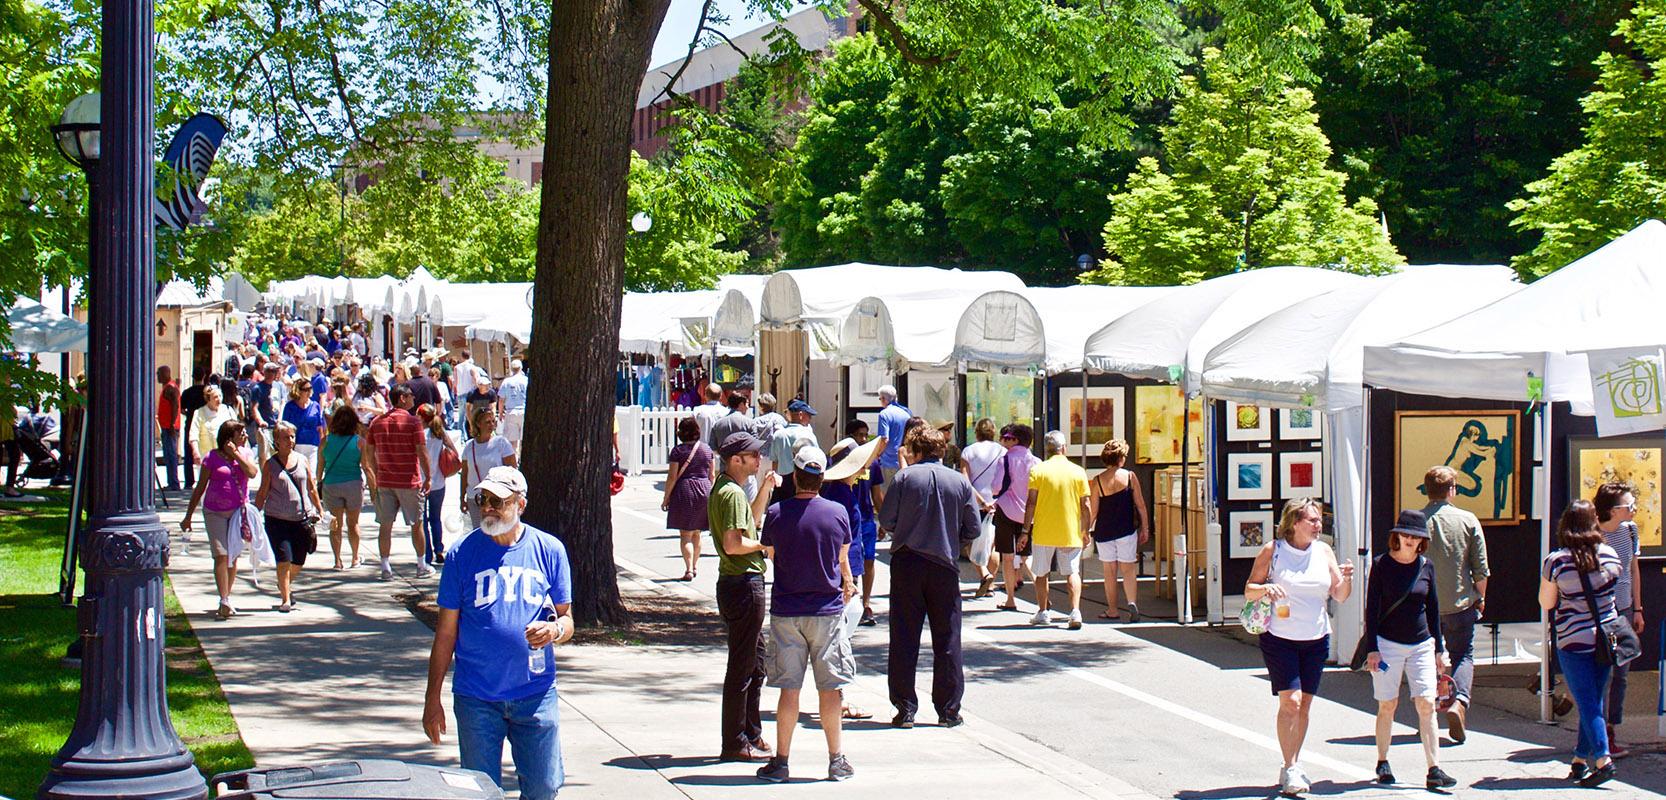 Melvindale Street Fair 2020.Ann Arbor Street Art Fair The Original